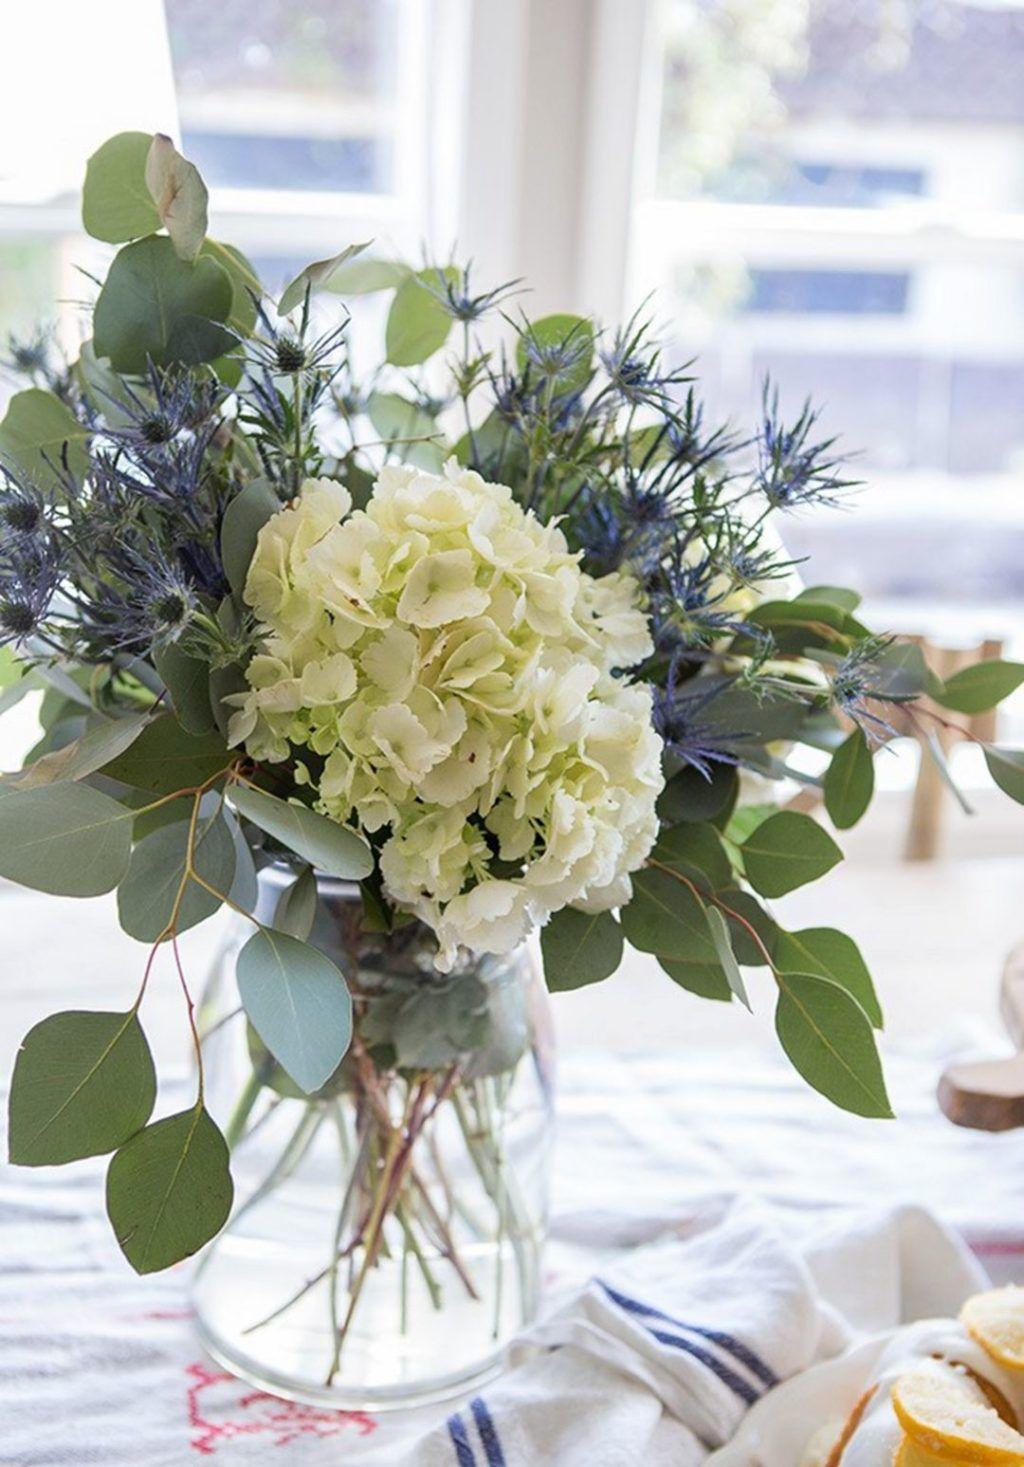 Beautify Your Home With Unbelievable Bouquet Flowers Decorating 10 Top Flower Arrangements Simple Hydrangea Flower Arrangements Artificial Flower Arrangements